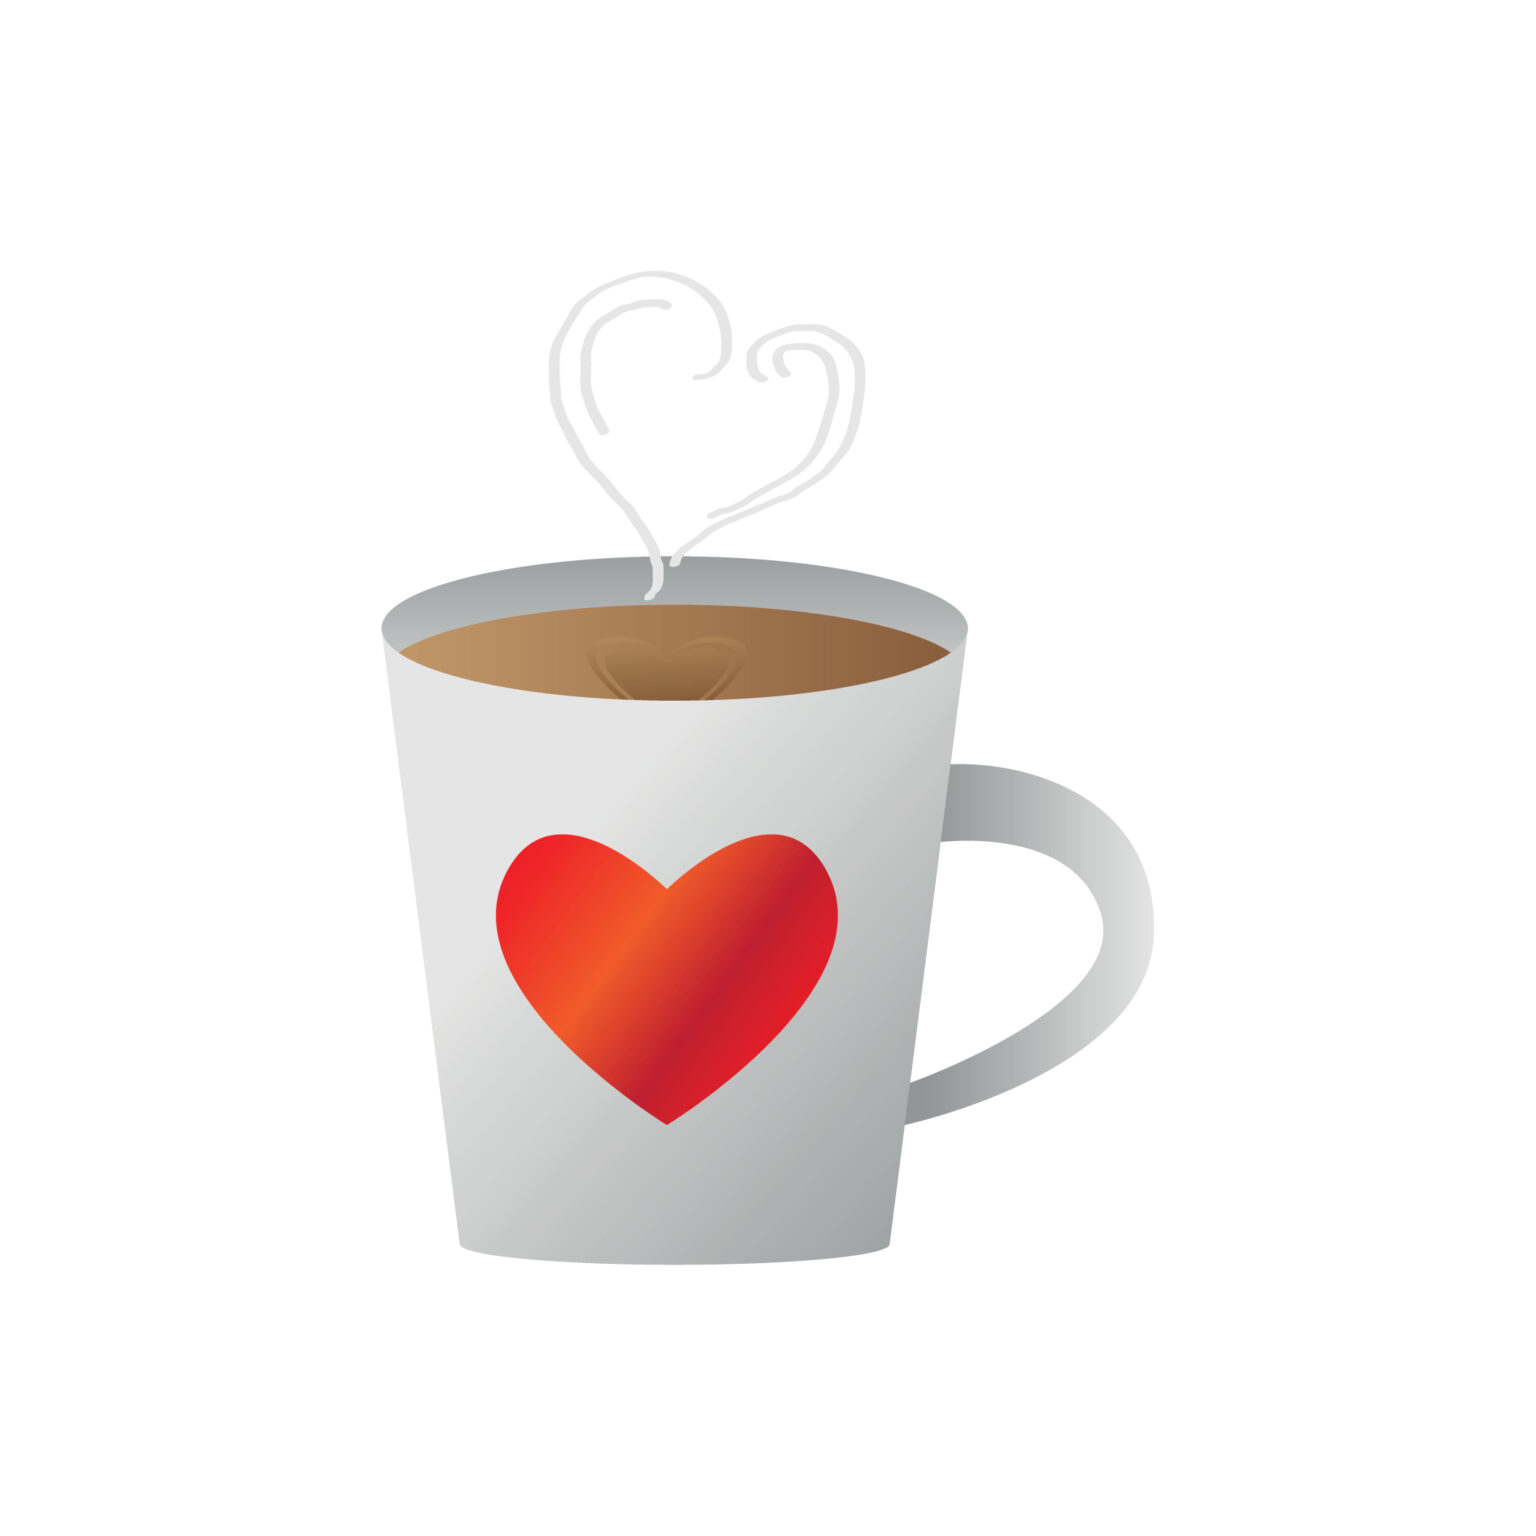 drink tea everyday